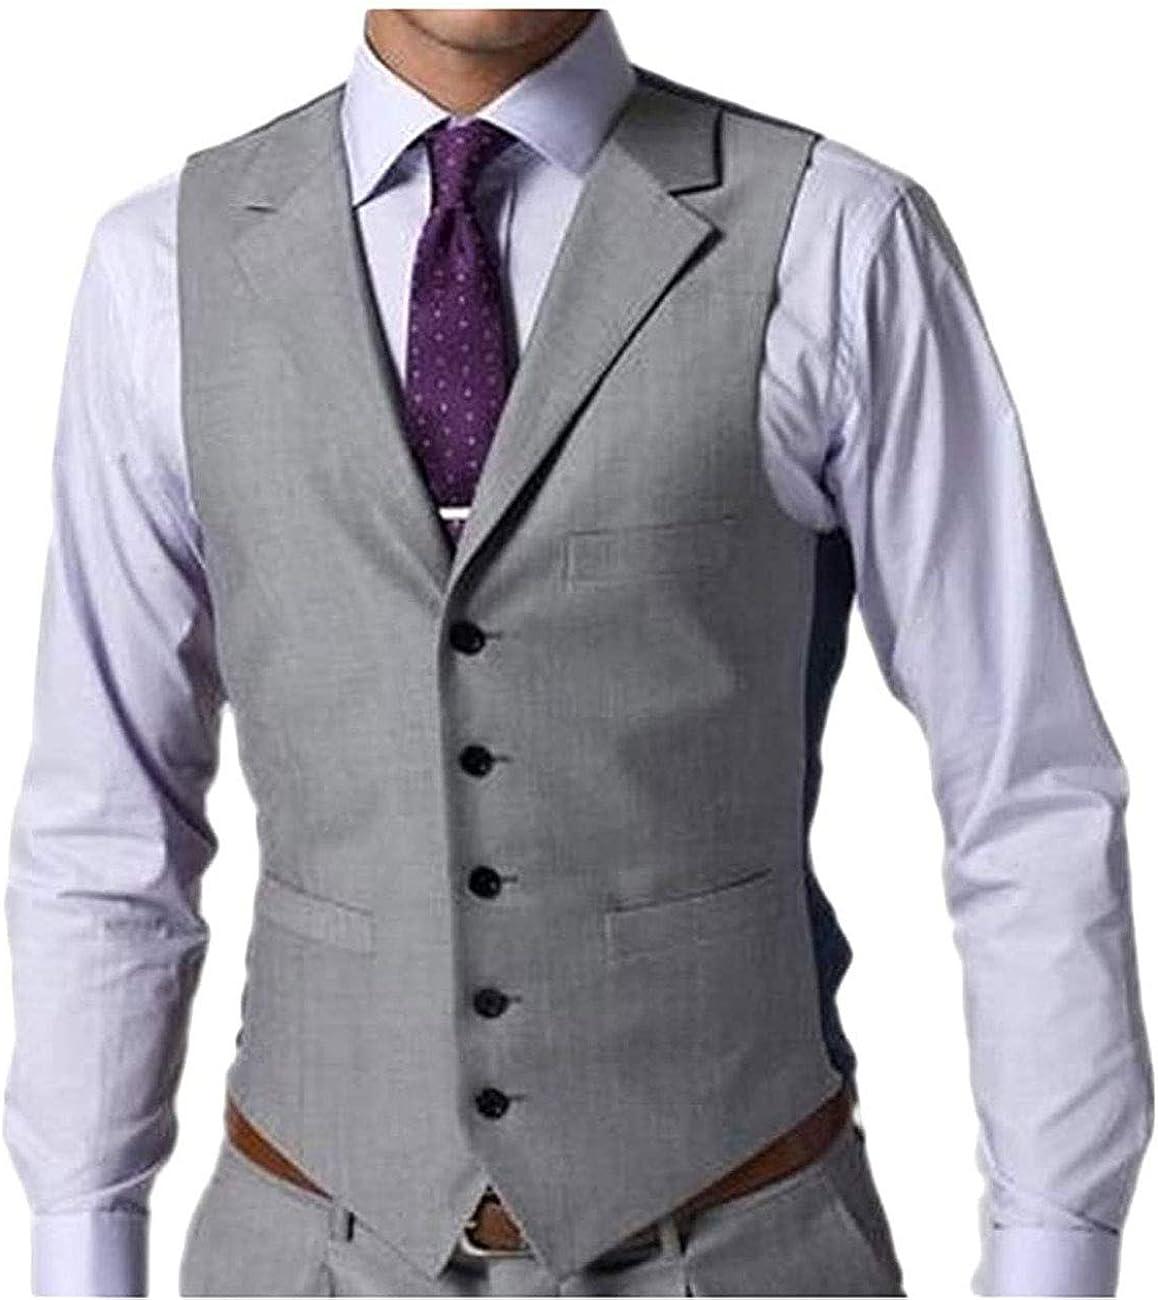 Wemaliyzd Men's Slim Fit Business Suit Vest Single Breasted V-Neck Waistcoat